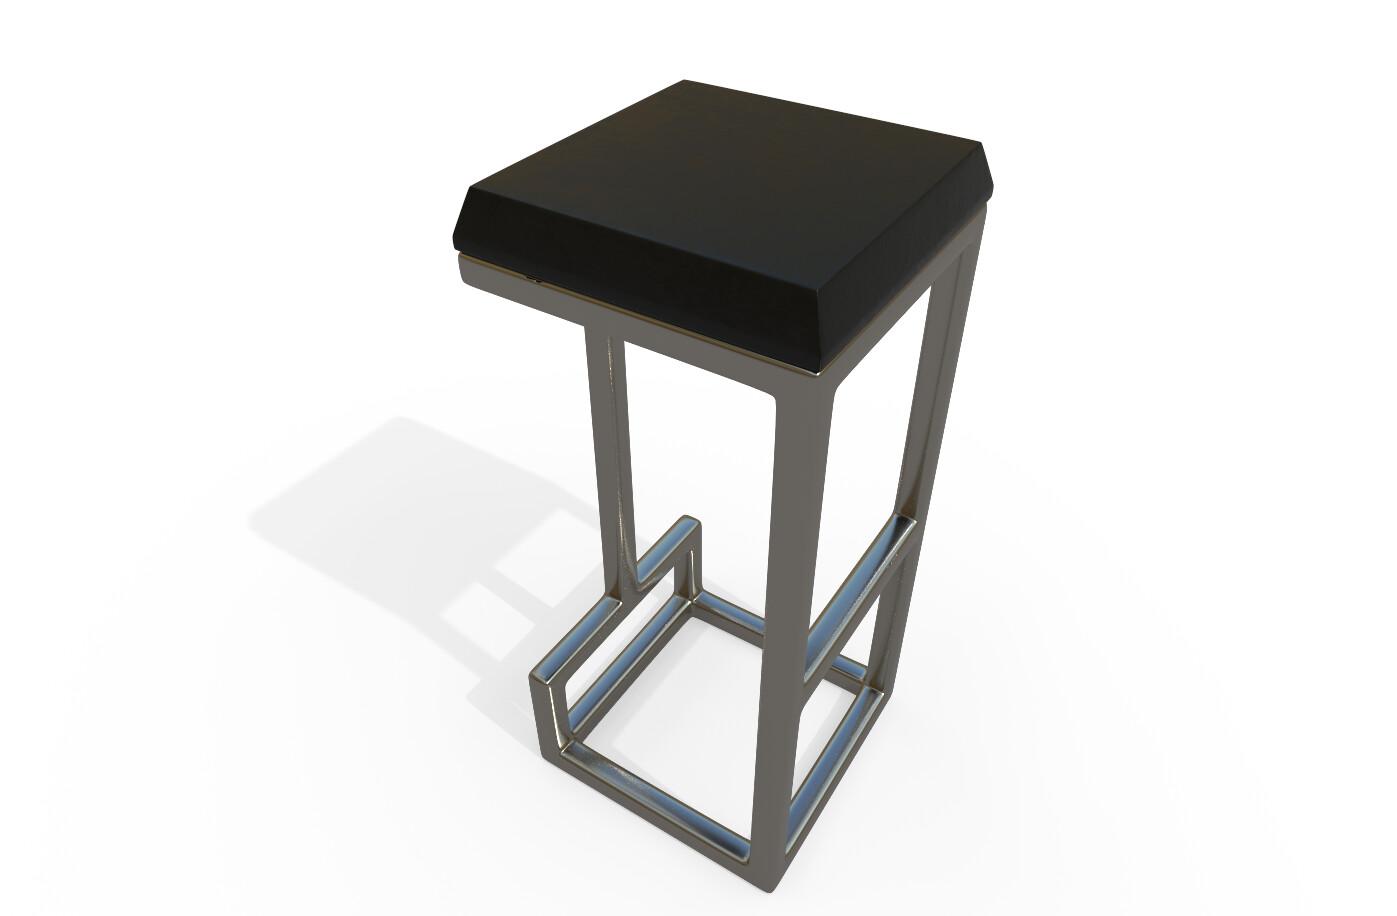 Joseph moniz designerbarstool001d